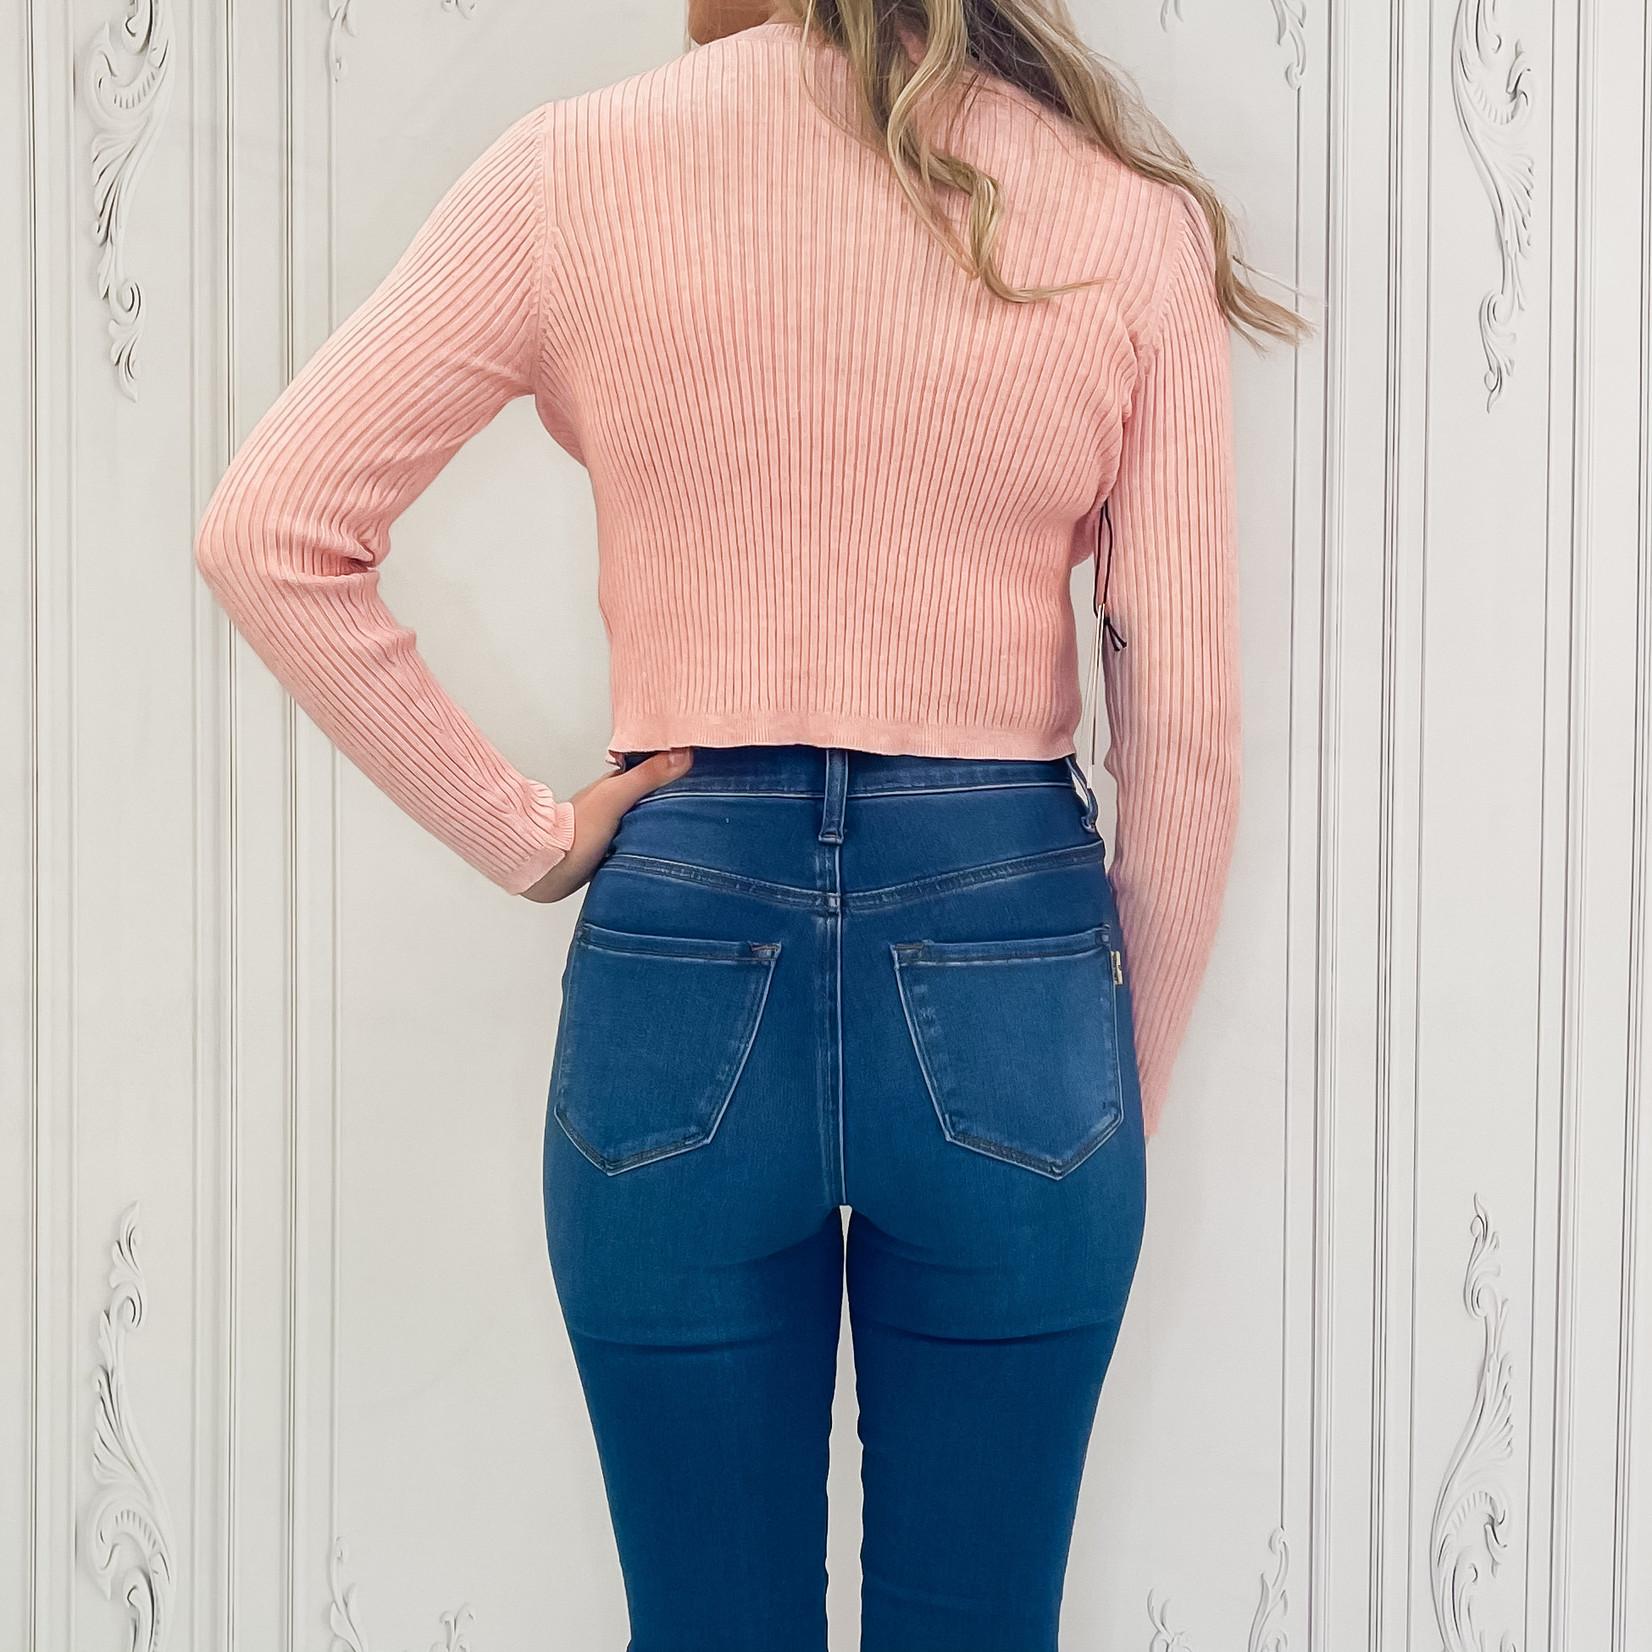 iyla sweater set